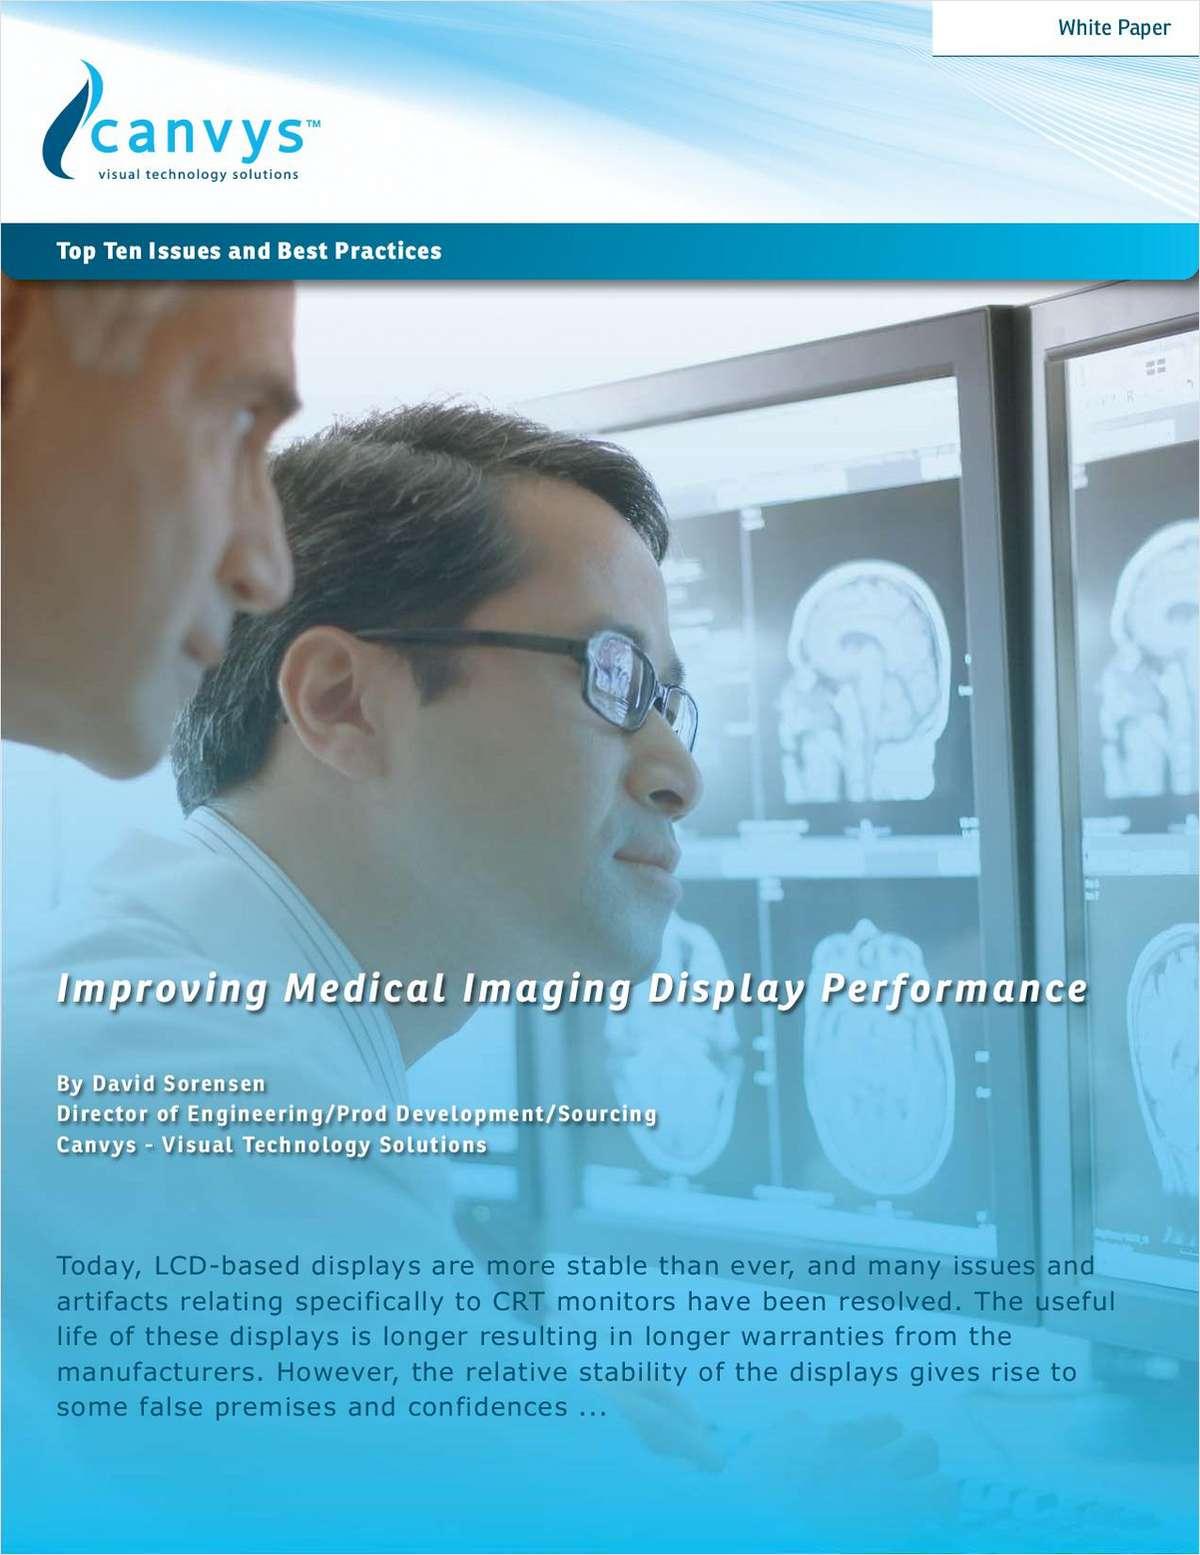 Improving Medical Imaging Display Performance